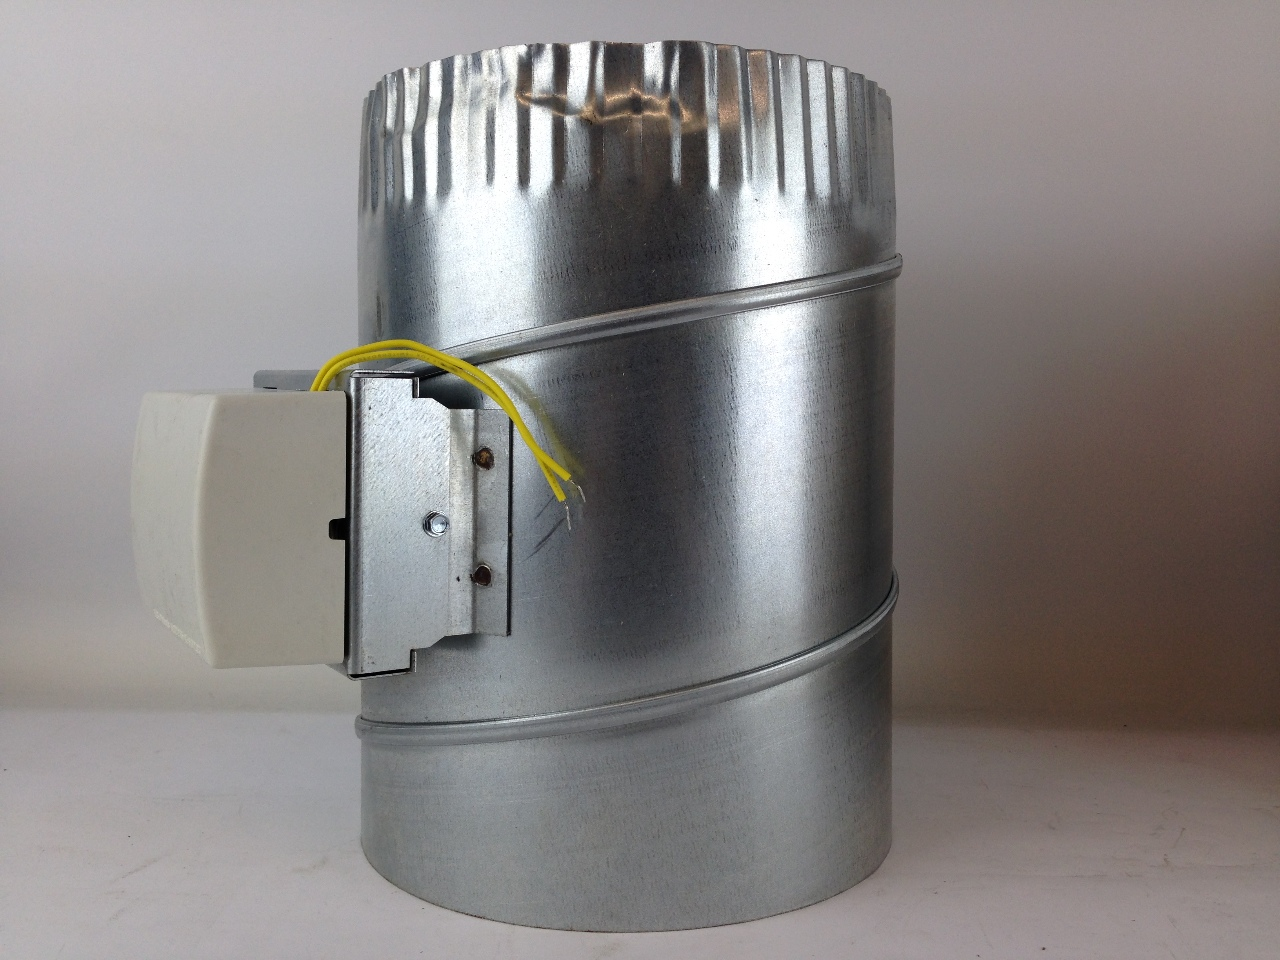 Motorized damper x4209 round zone damper w motor 8 for Zone damper motor repair